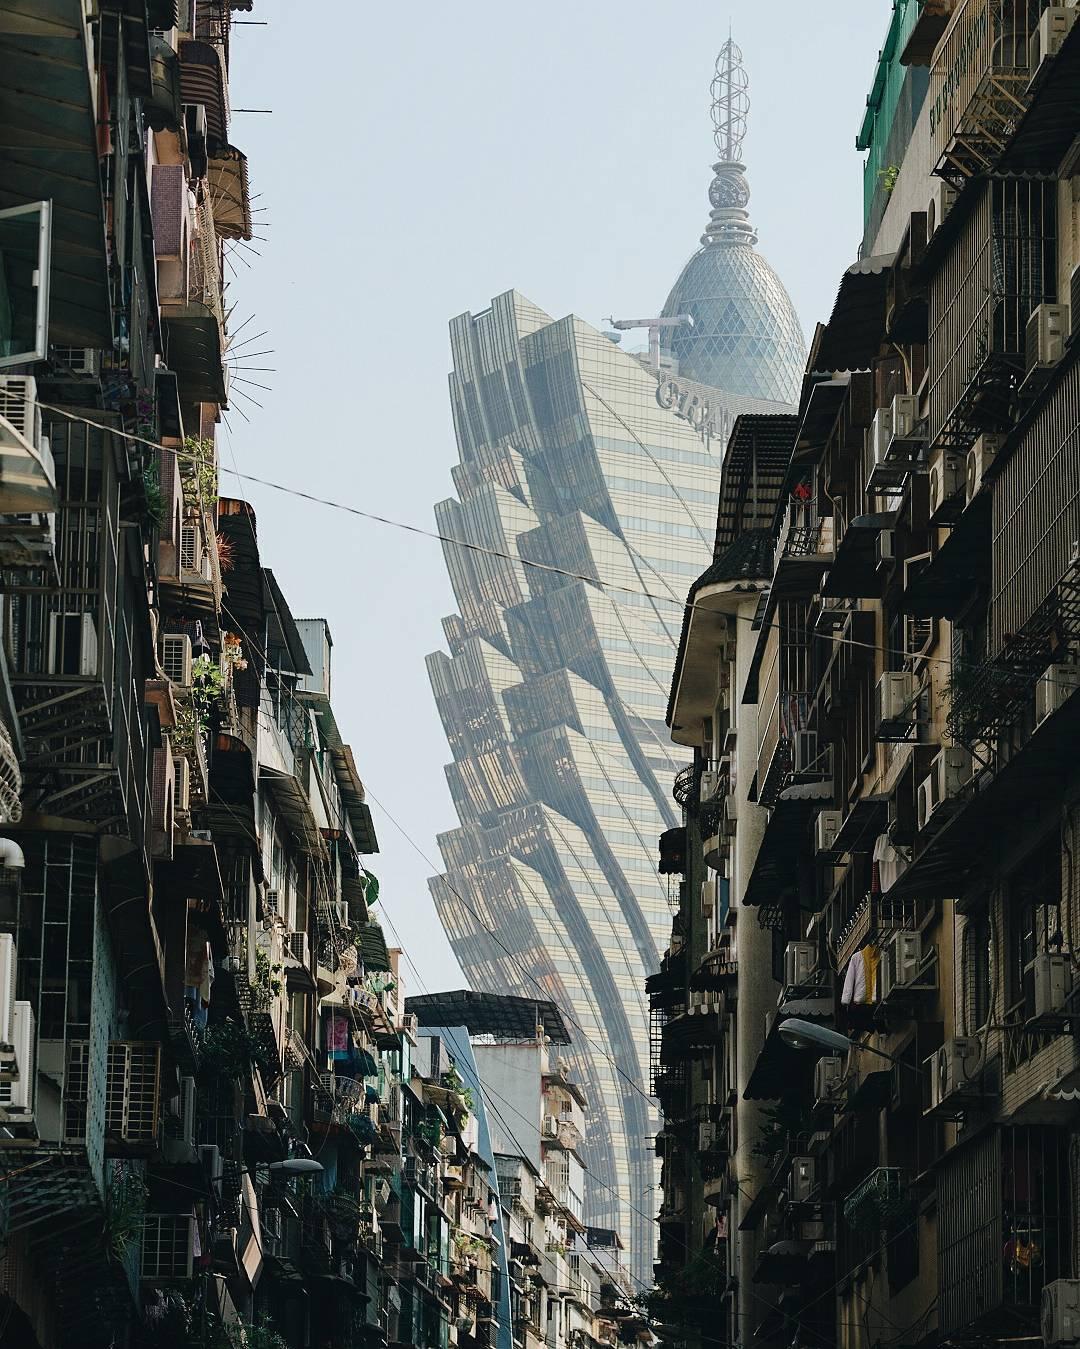 Zdjecia miasta, drapacze chmur, ulica